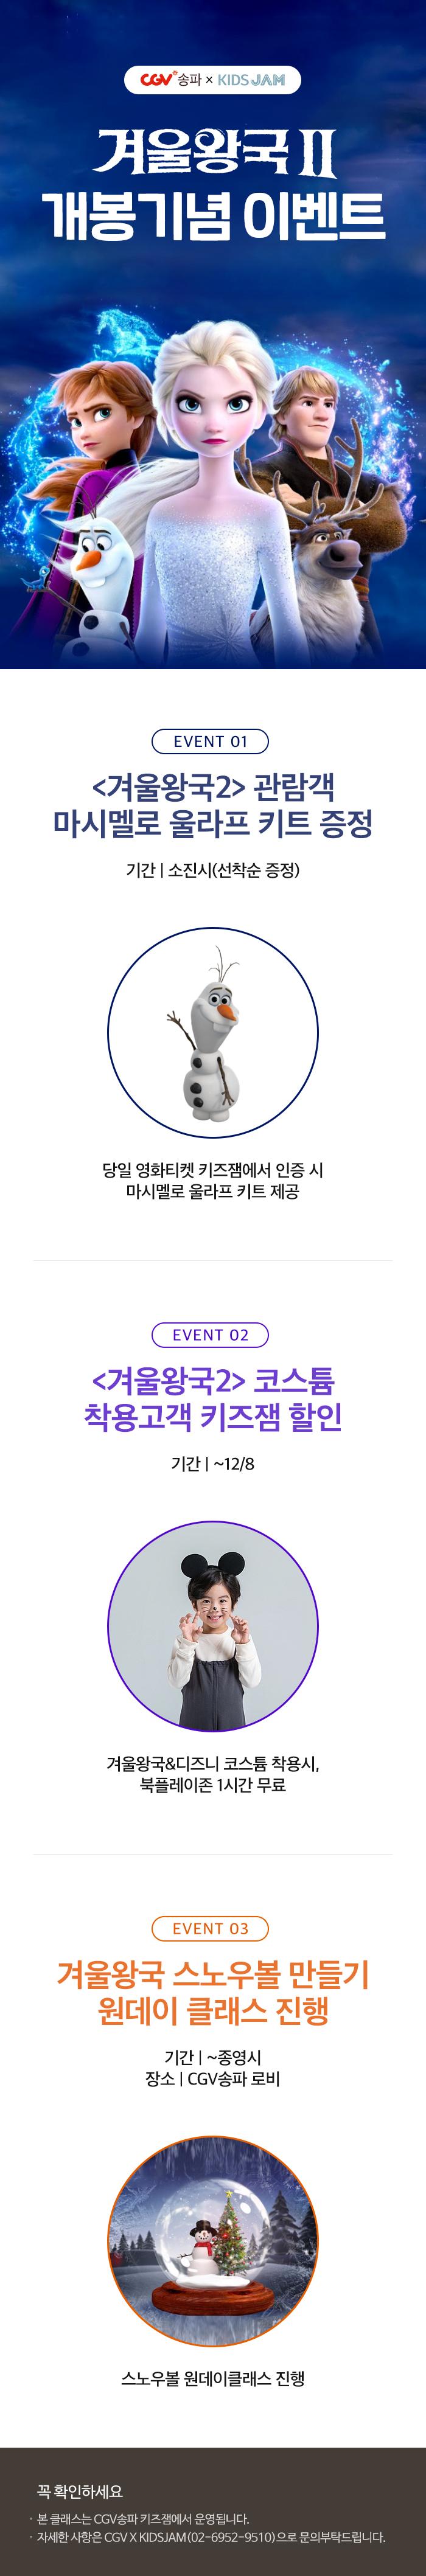 CGV극장별 [CGV송파] 키즈잼 겨울왕국 2 개봉기념 이벤트